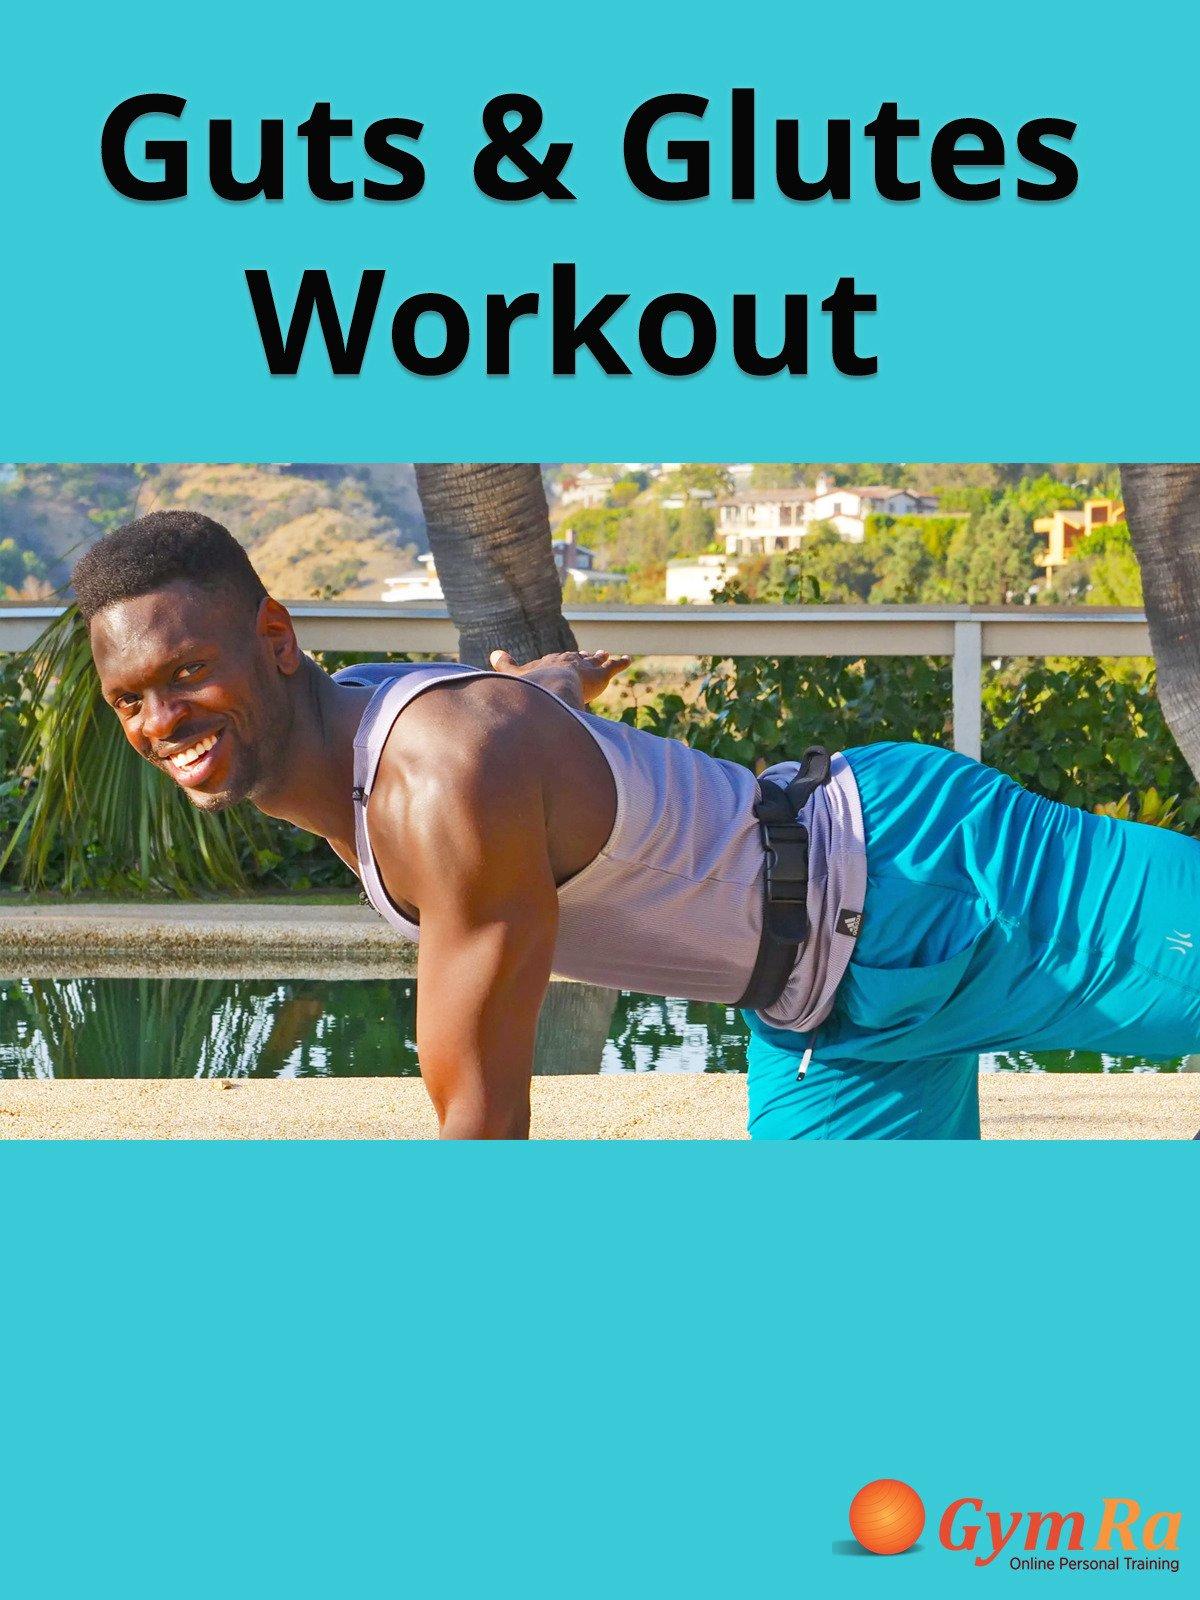 Guts & Glutes Workout